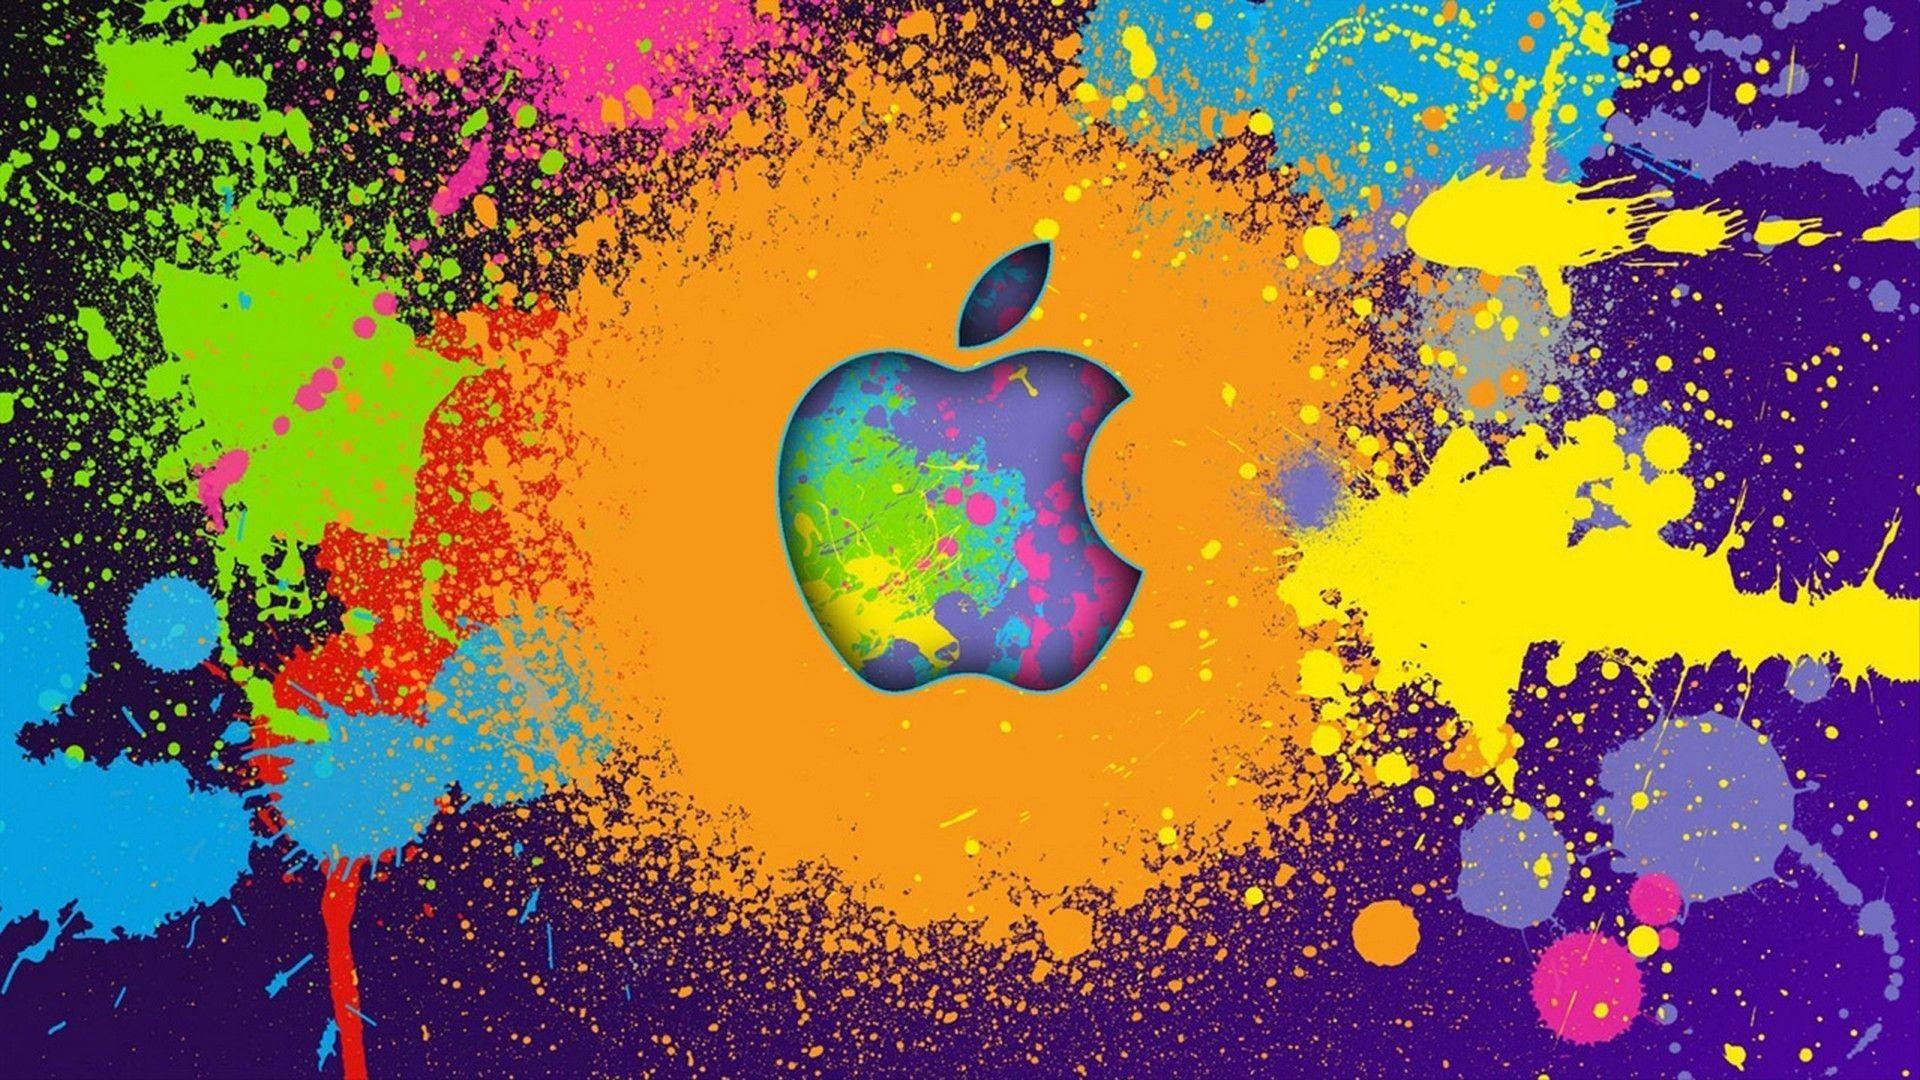 Graffiti Characters Wallpaper HD Apple logo wallpaper